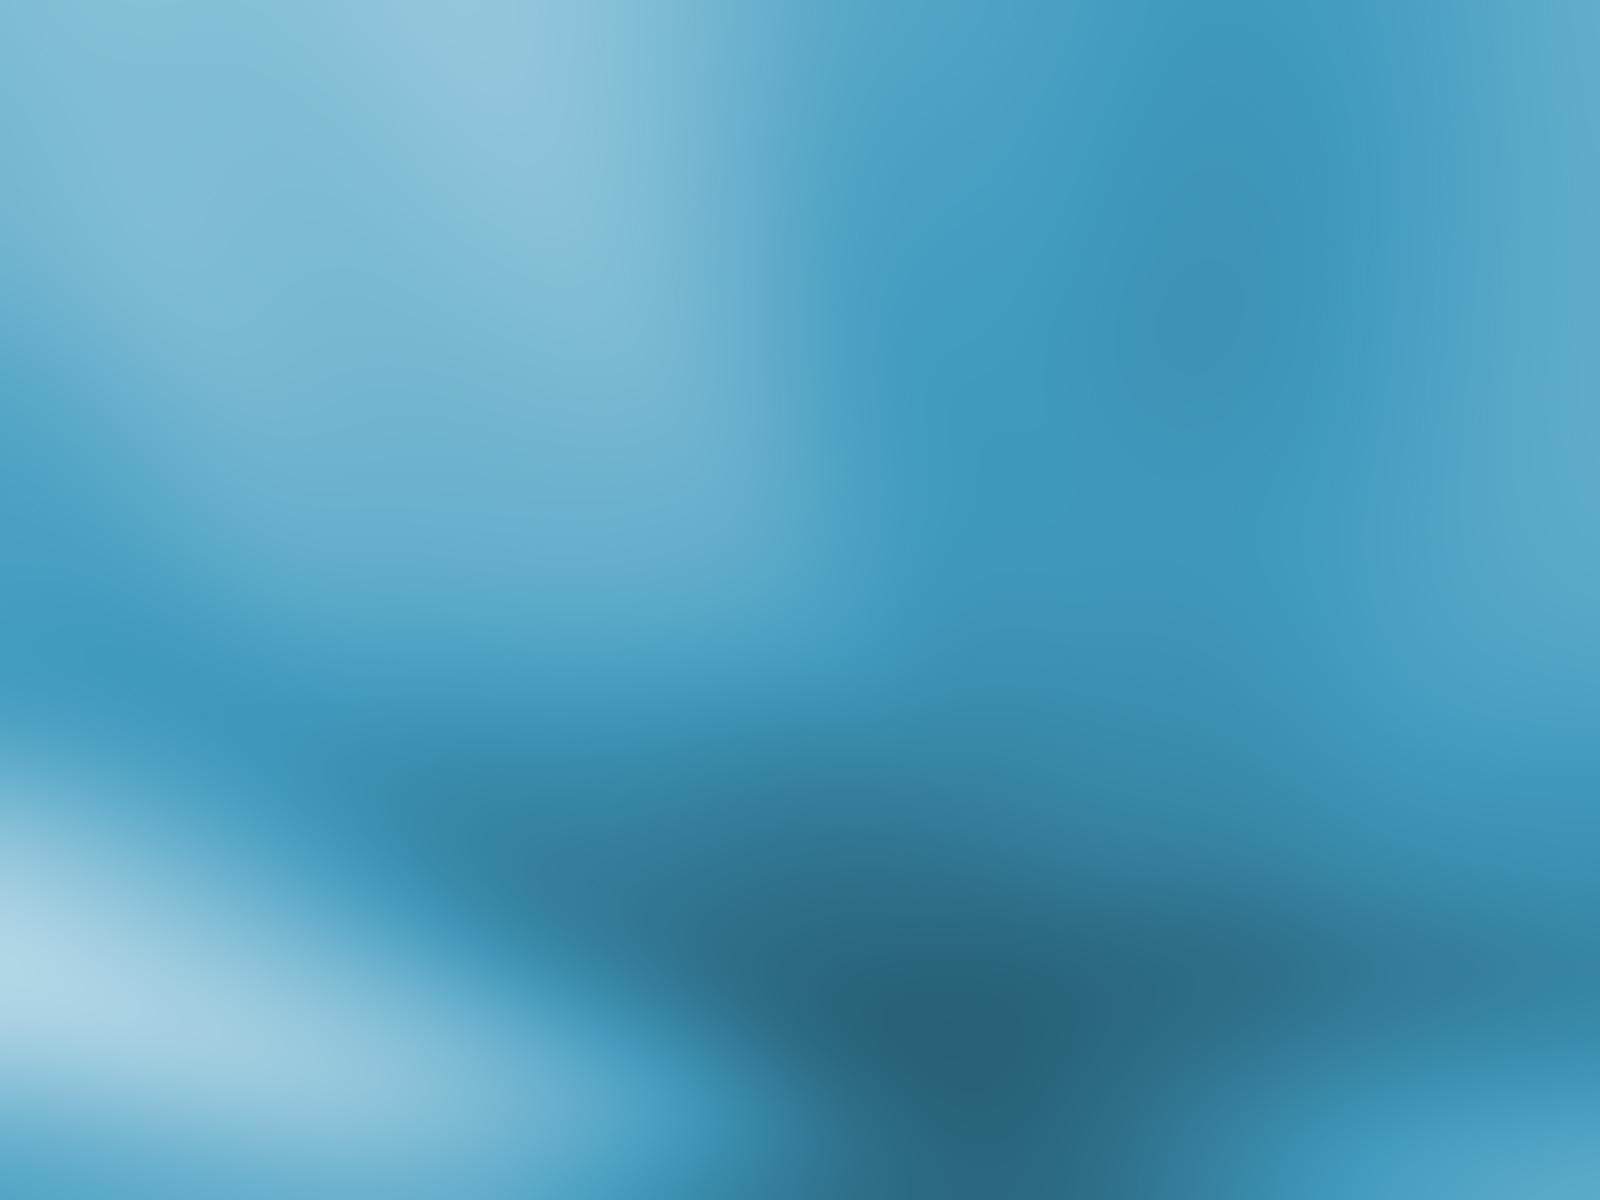 top desktop blue wallpapers blue wallpaper blue background hd 24jpg 1600x1200